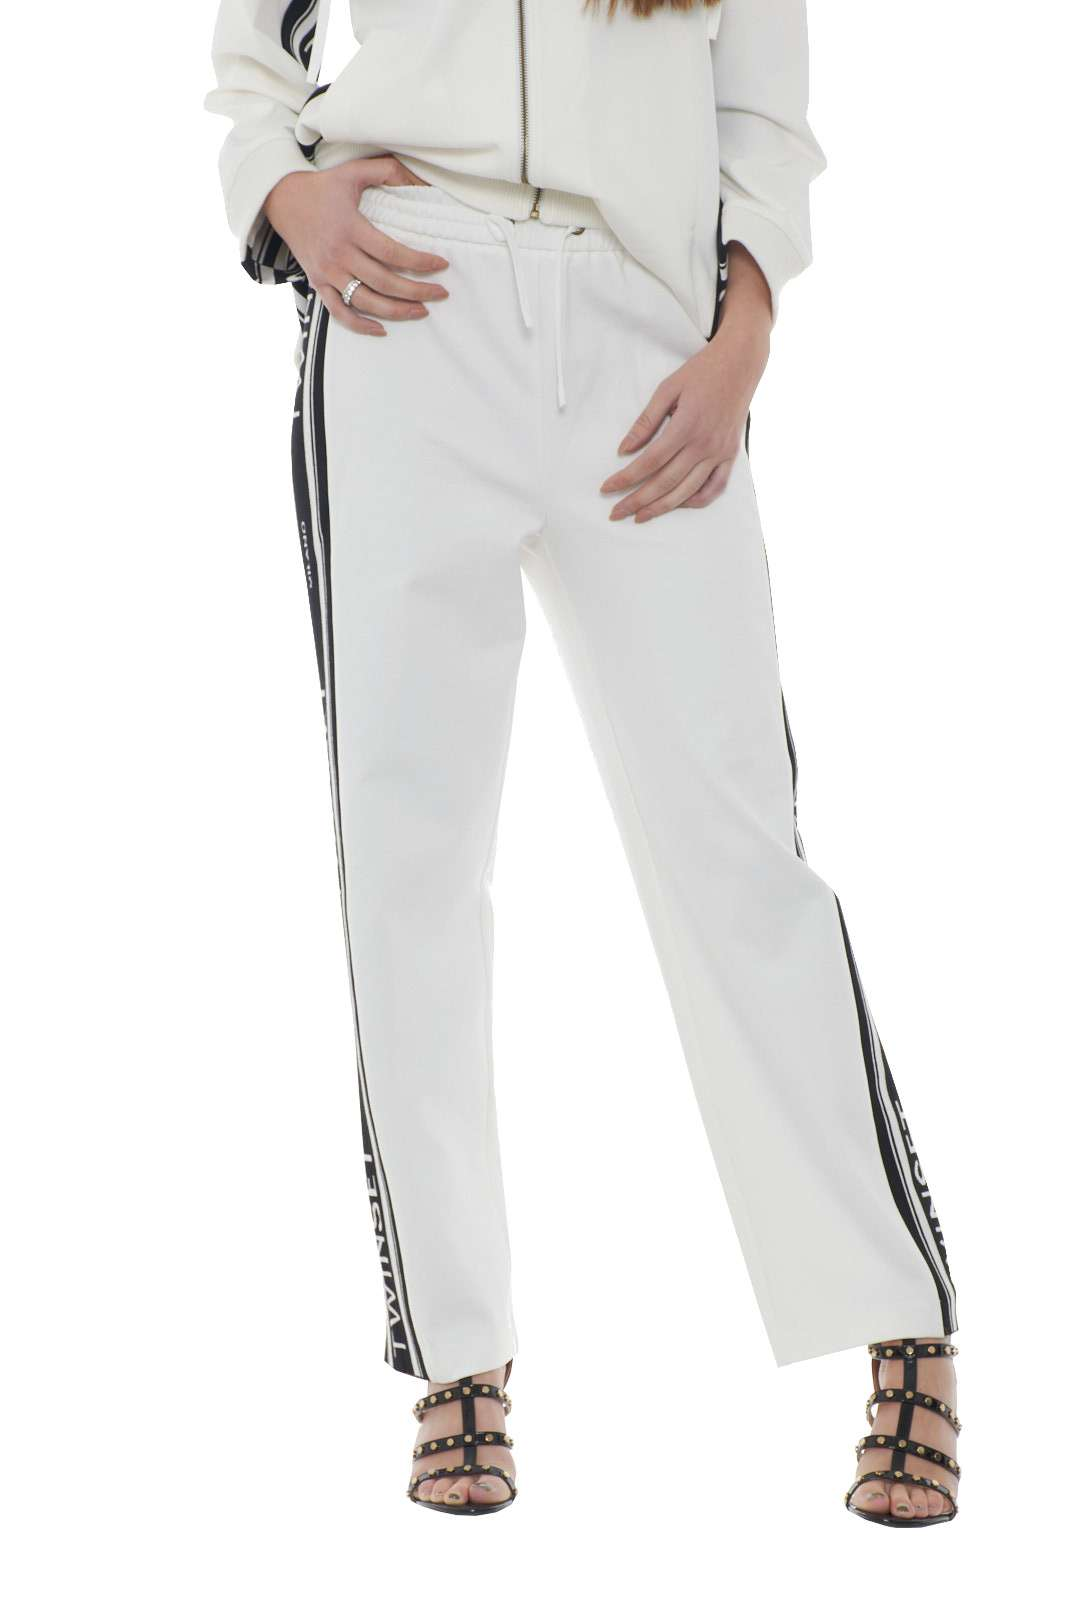 https://www.parmax.com/media/catalog/product/a/i/PE-outlet_parmax-pantaloni-donna-TwinSet-201TP2072-A.jpg